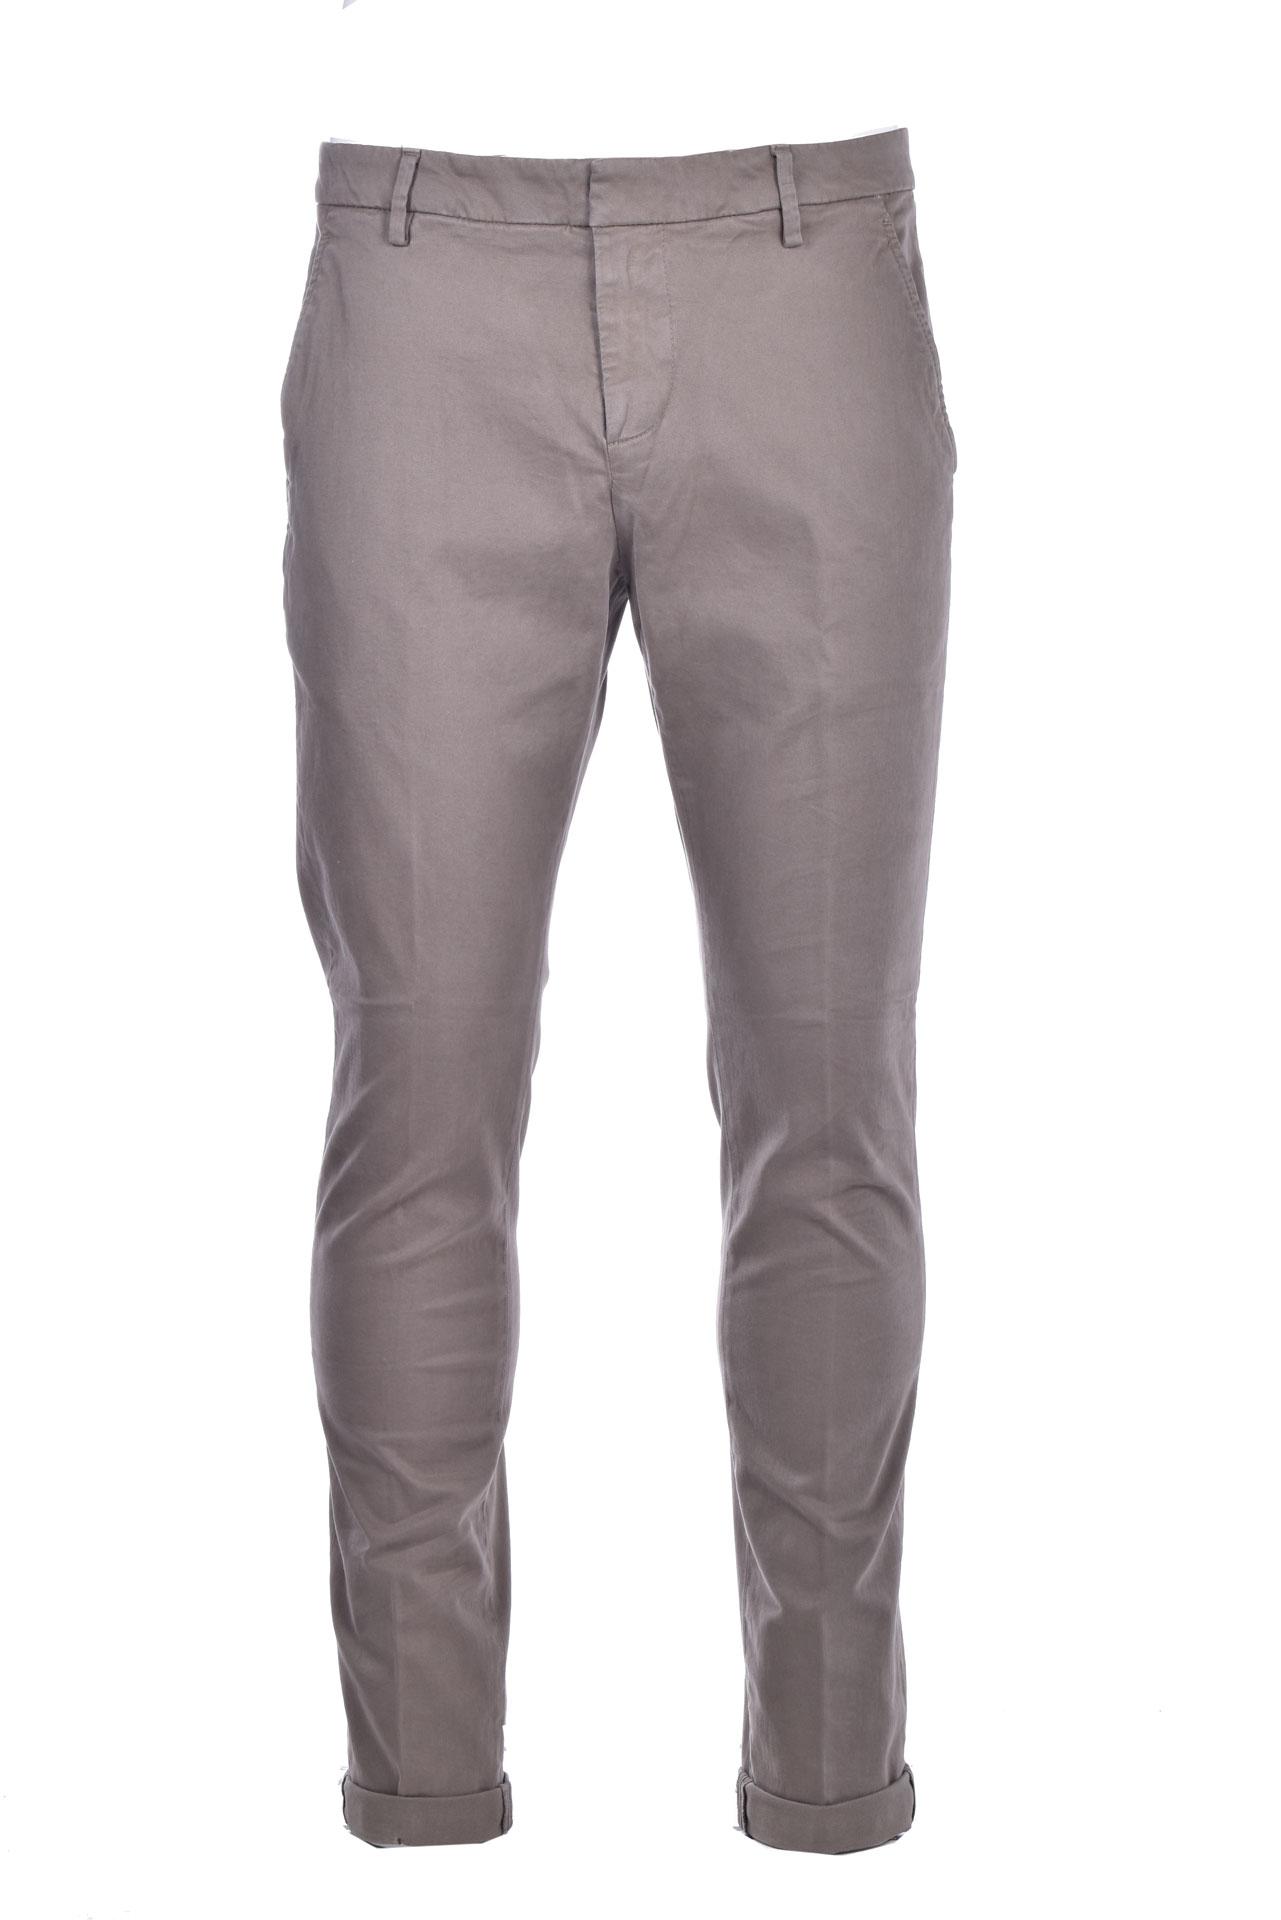 Pantalone chino slim in gabardin DONDUP | Pantaloni | UP235GSE043PTDDU636U